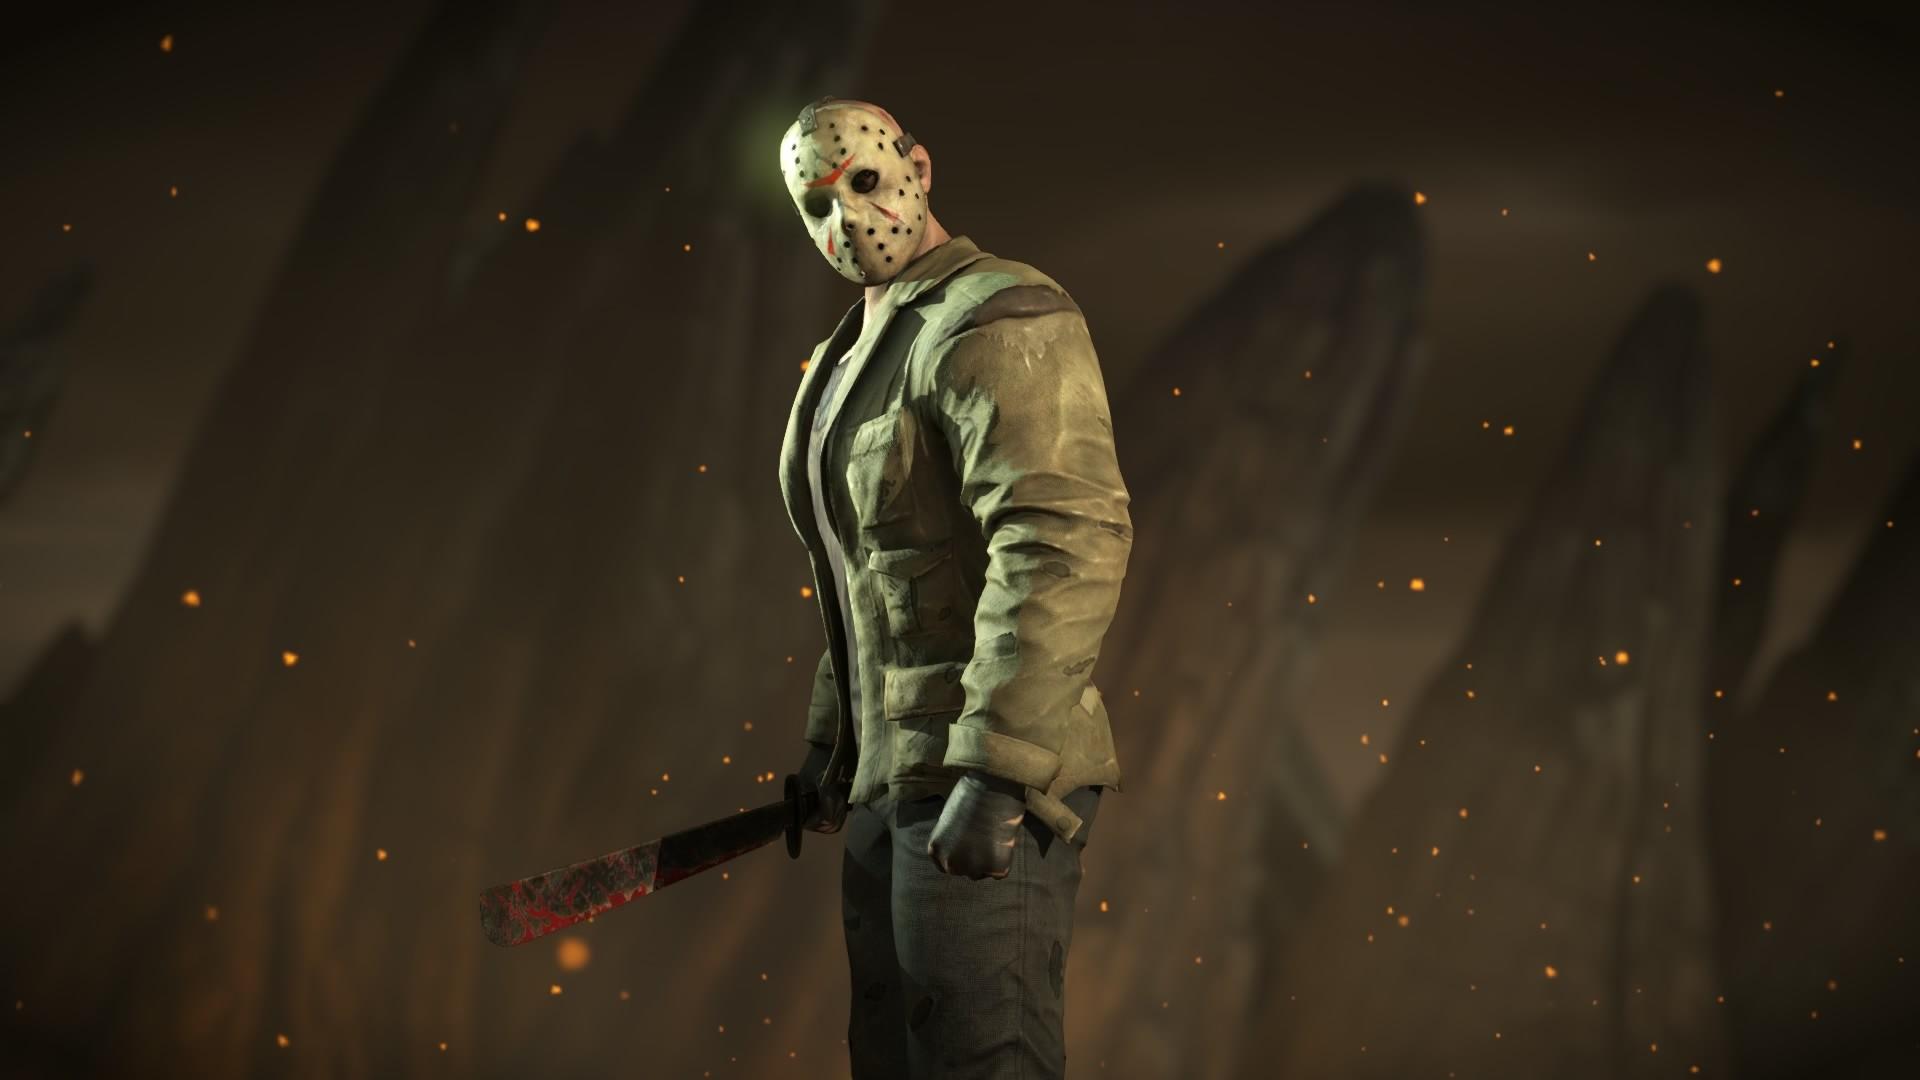 Jason voorhees · Mortal-Kombat-X_20150506142104.jpg 1,920×1,080 pixels